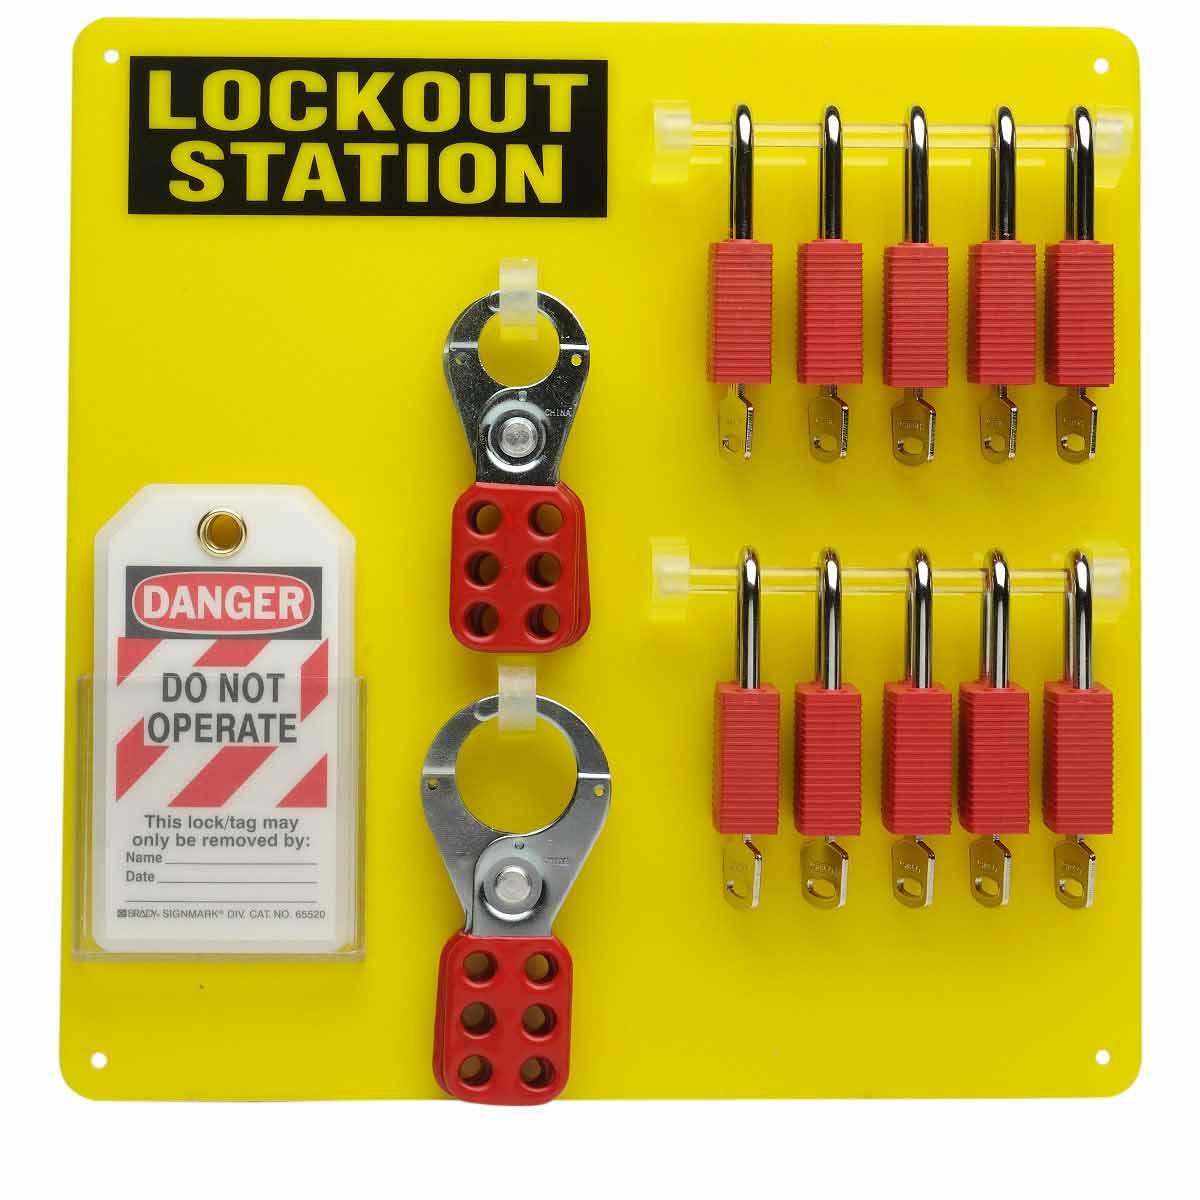 Brady® 51187 Padlock Center Lock Board, Filled, 26 Pieces, 10 Padlocks, 13-1/2 in H x 13-1/2 in W x 3/16 in D, Wall Mount, Language: English